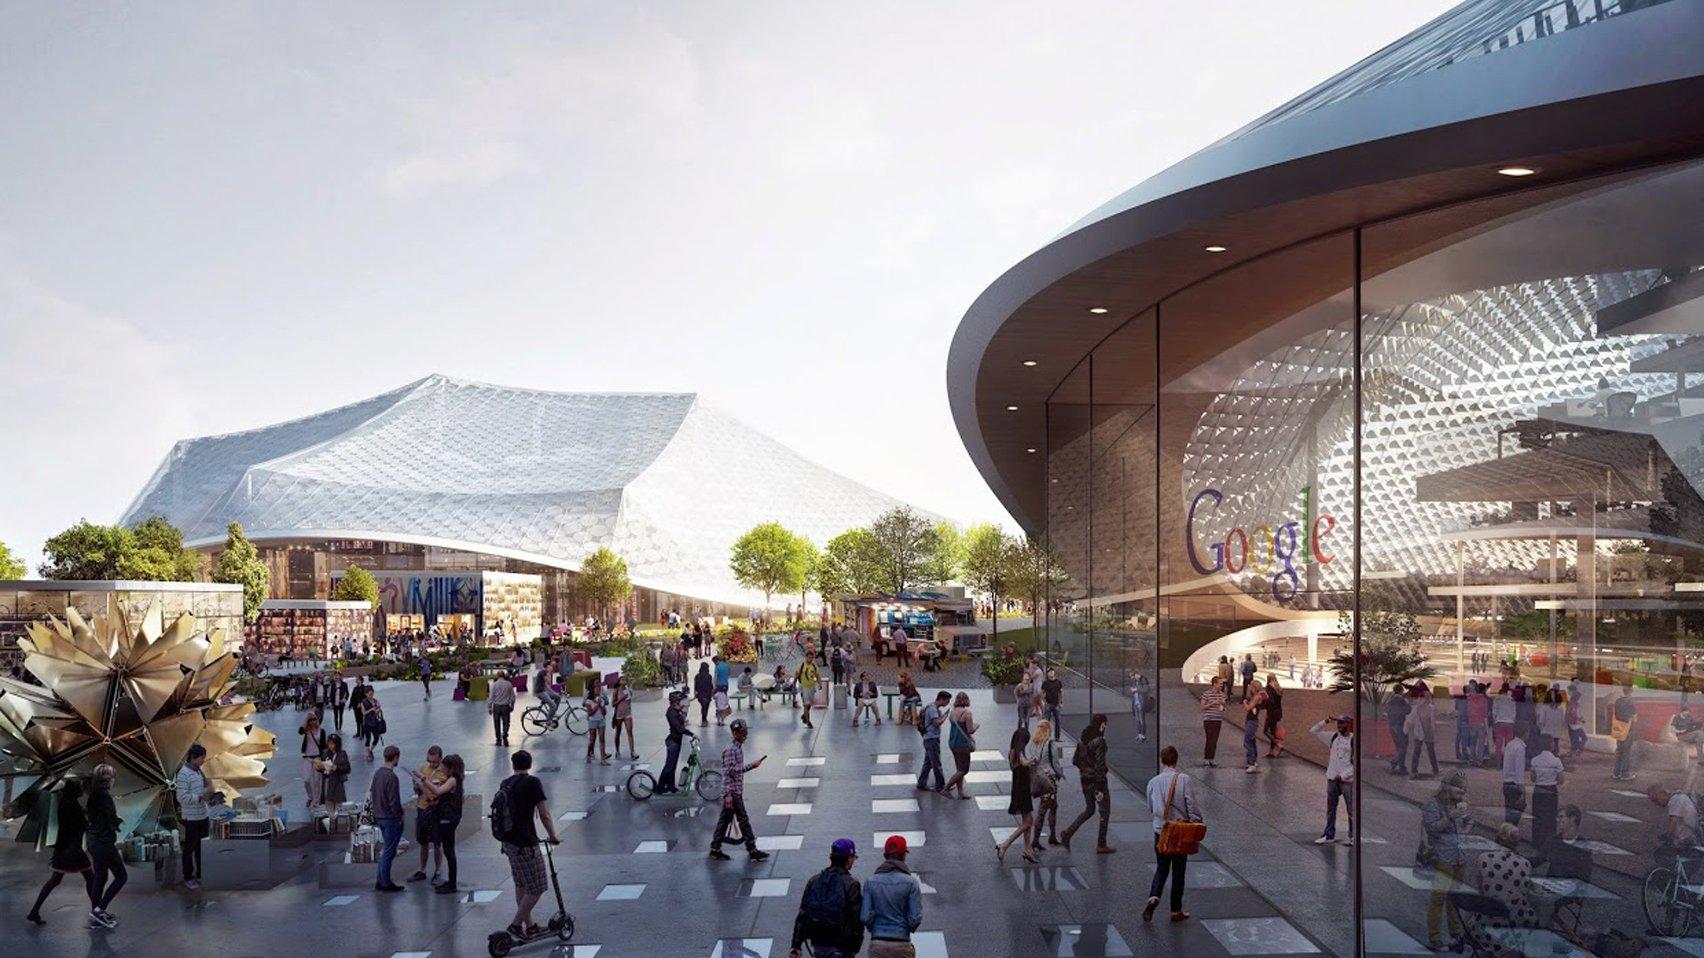 BIG and Heatherwick Studios to design Google's London headquarters